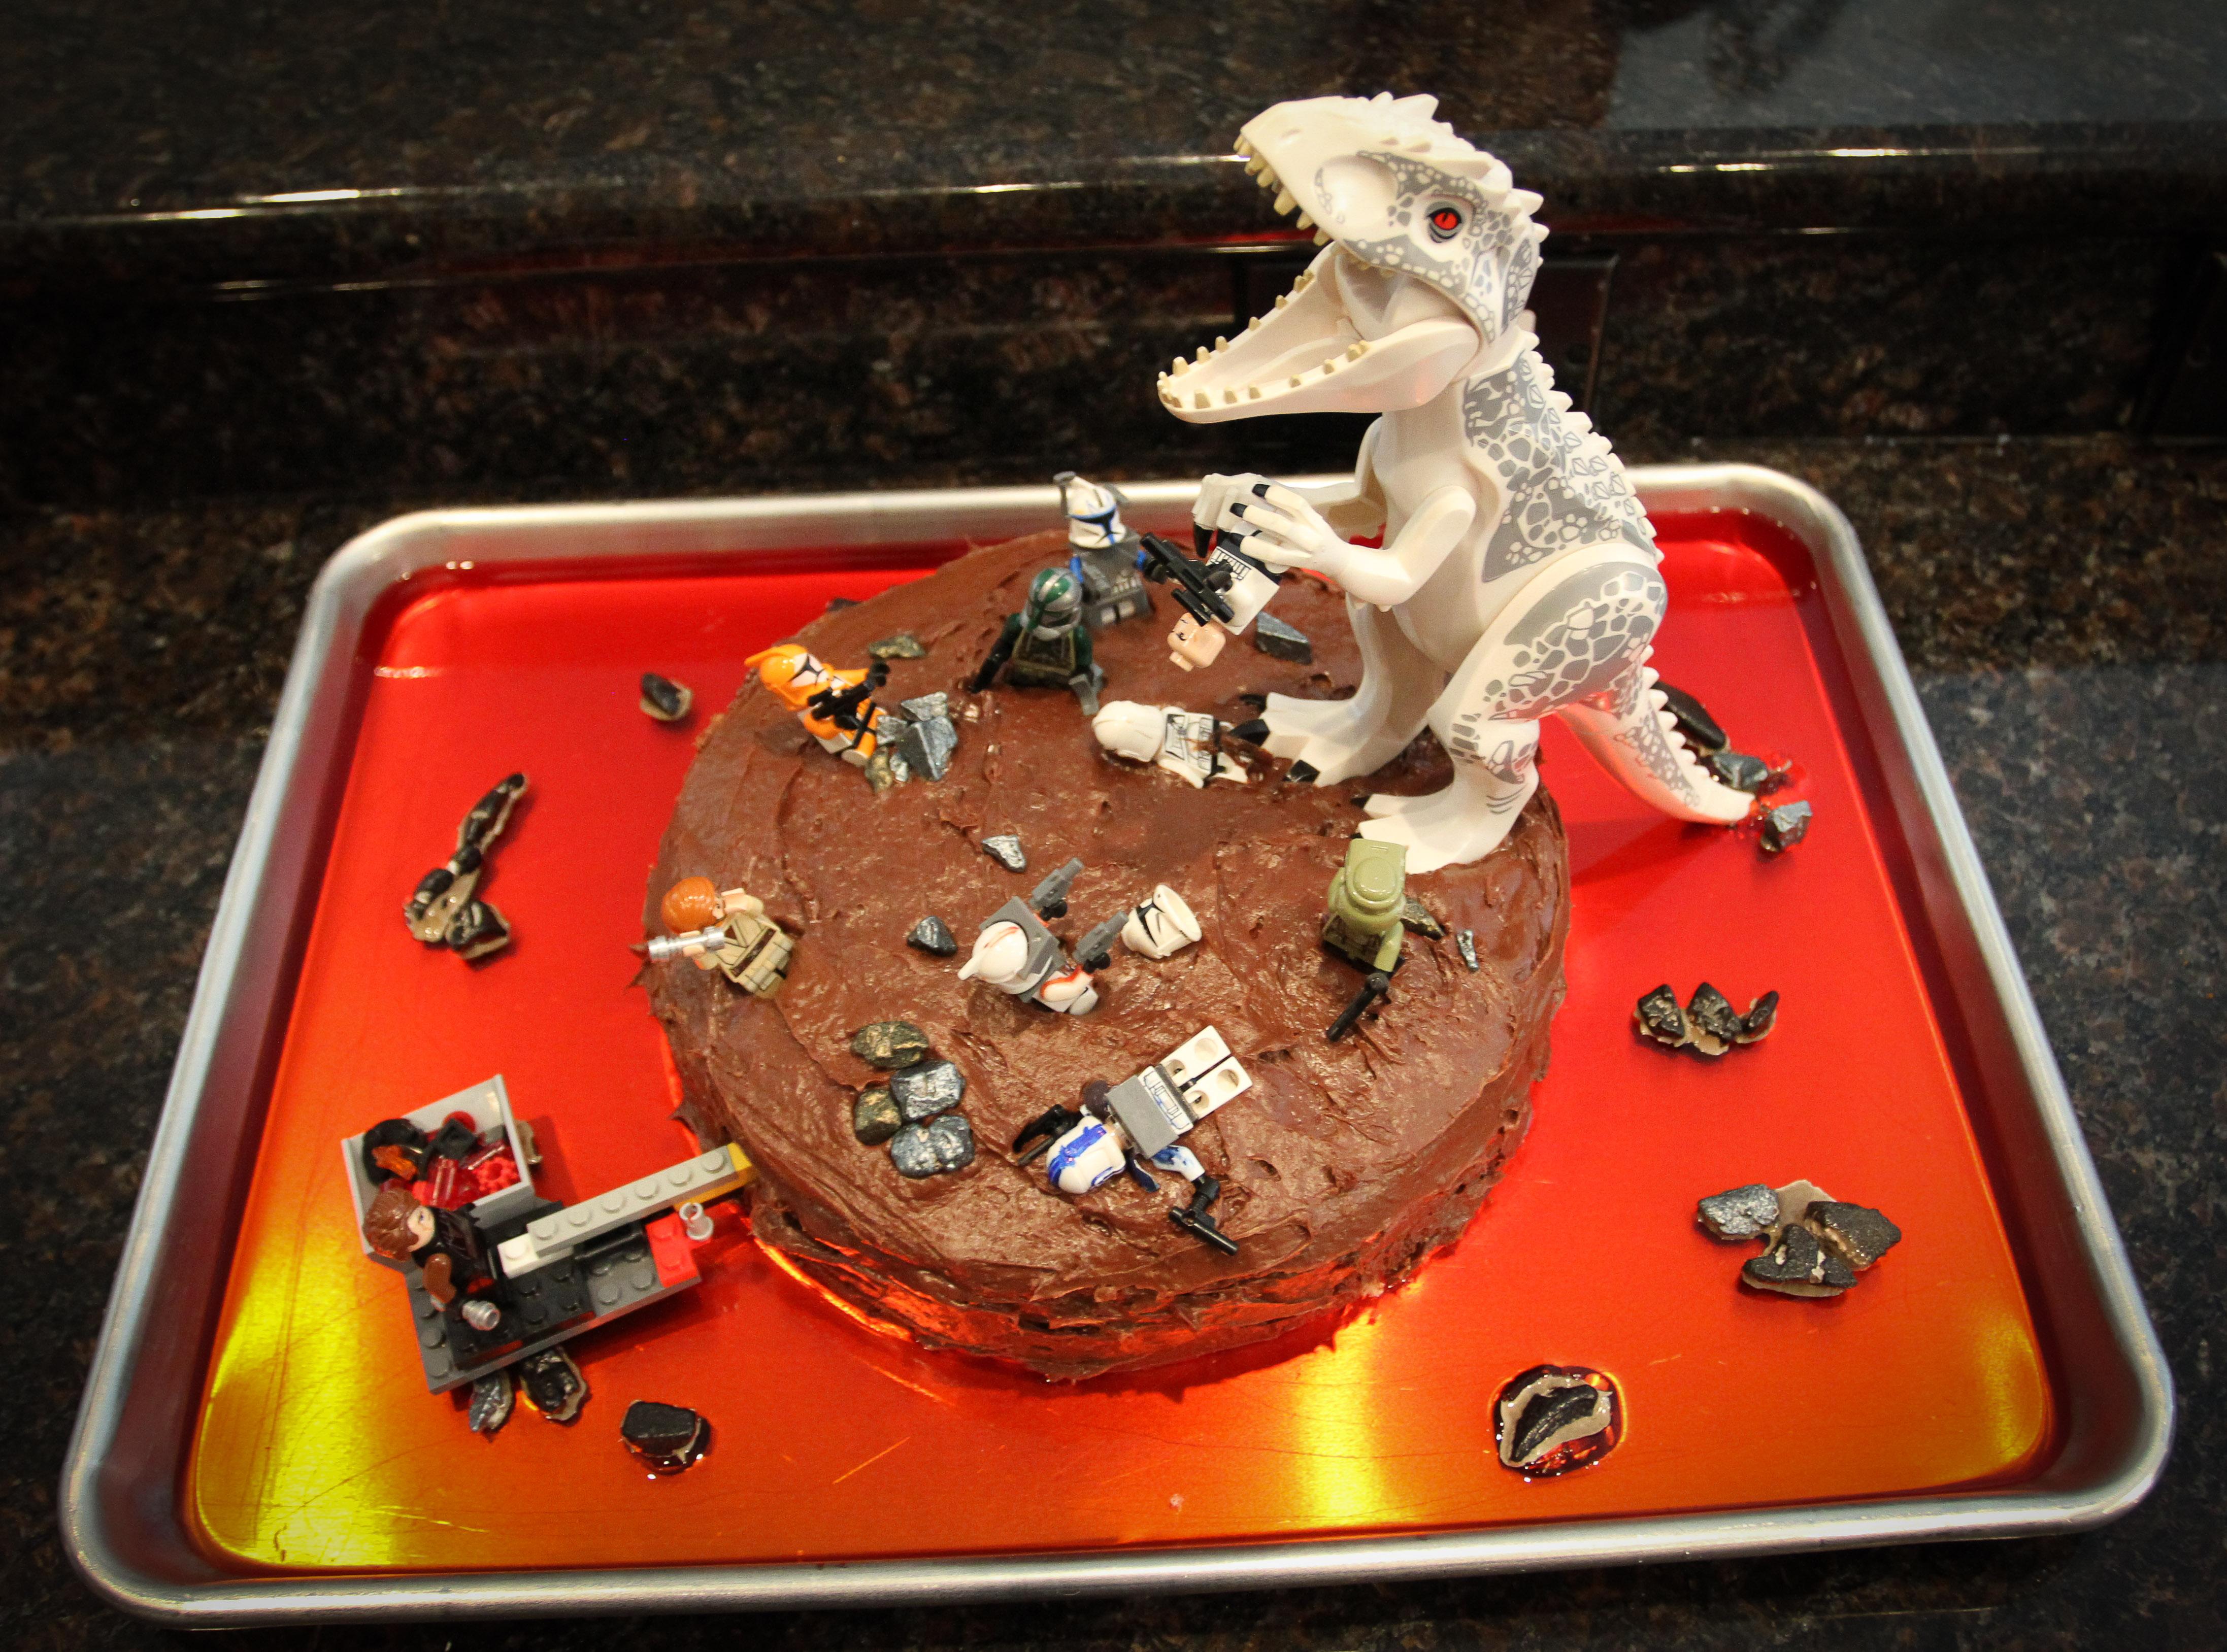 Star Wars Plus A Little Jurassic World Sweetly Nestled